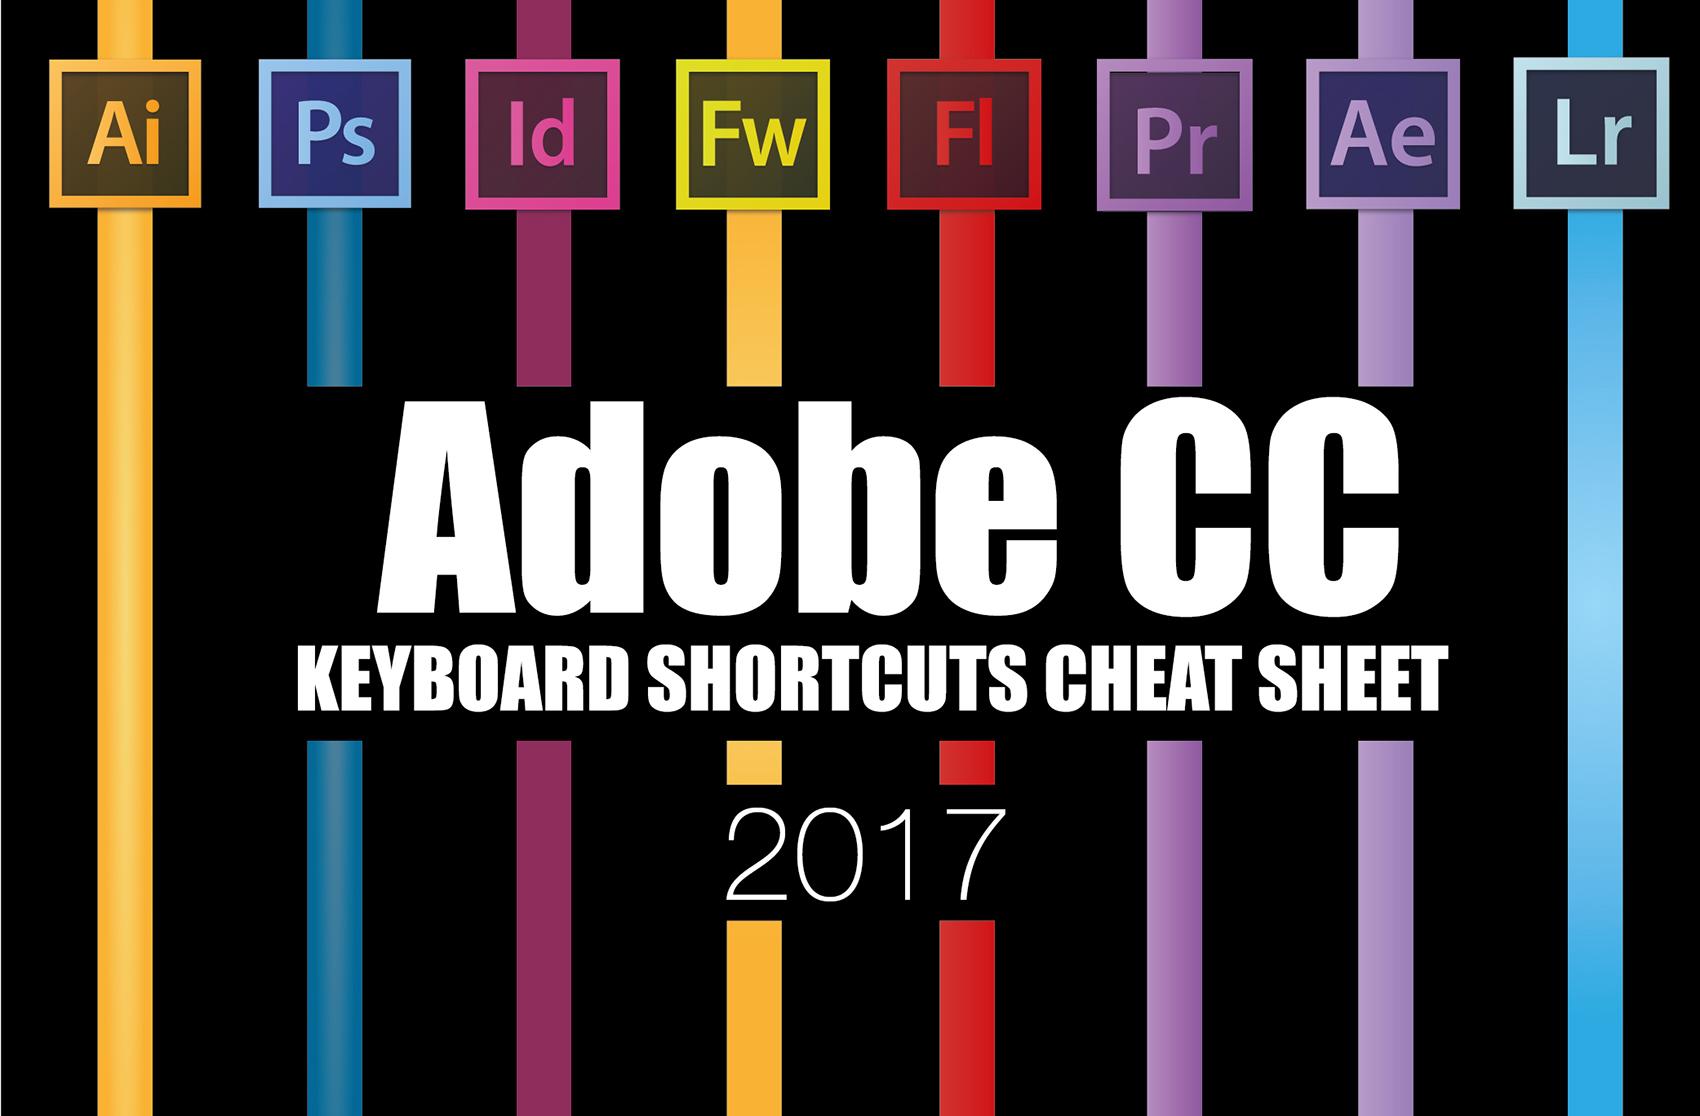 Keyboard Shortcuts Cheat Sheet 2017